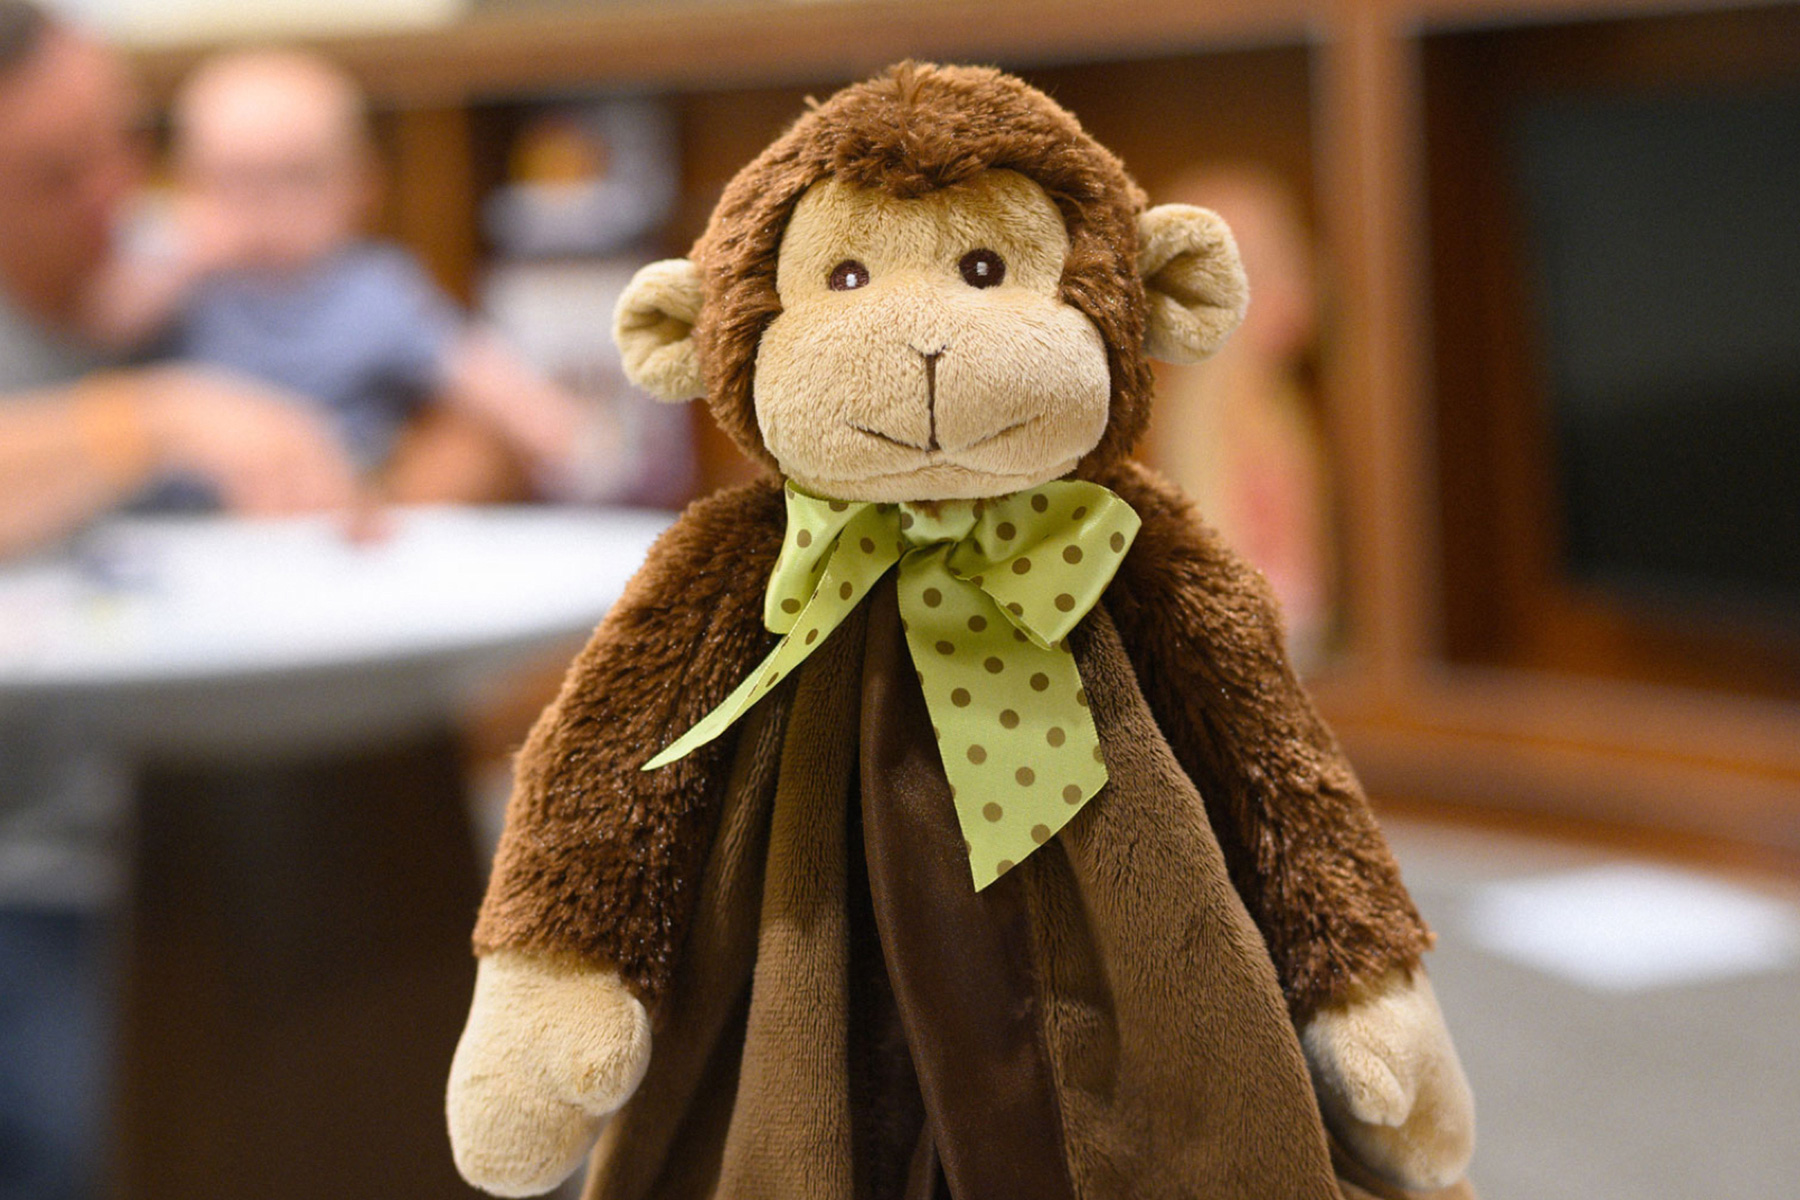 Stinky Monkey - a stuffed monkey toy with a polka dot ribbon bow around his neck.